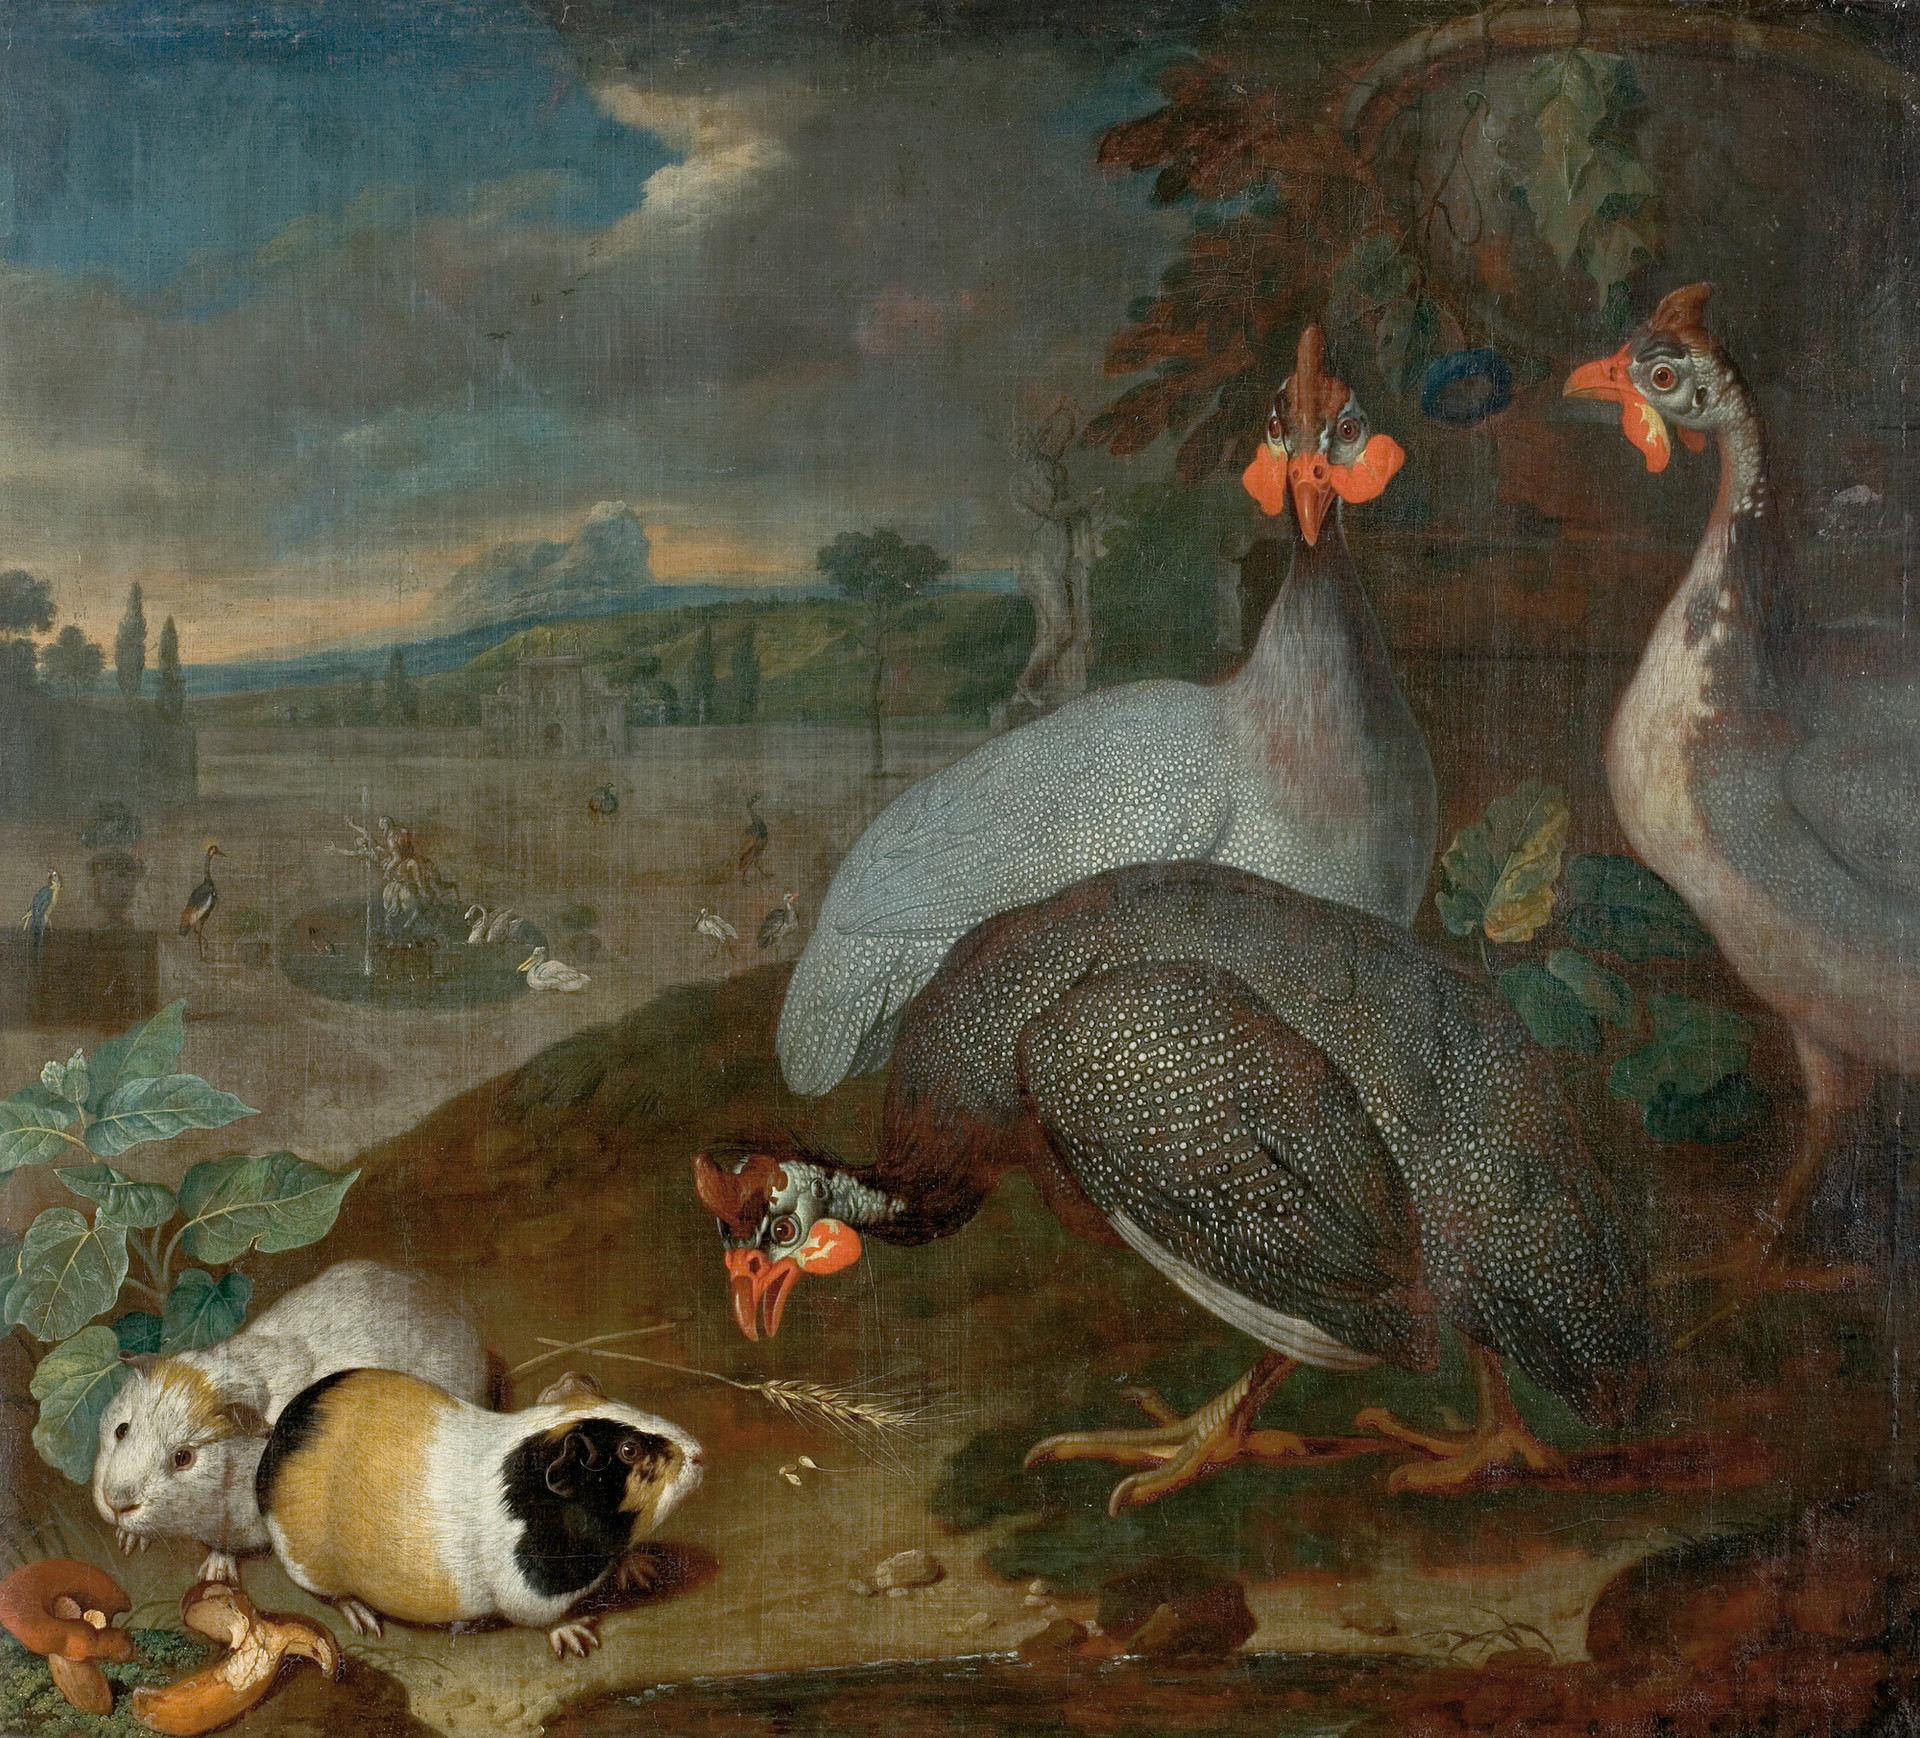 Guinea Fowl with Guinea Pigs